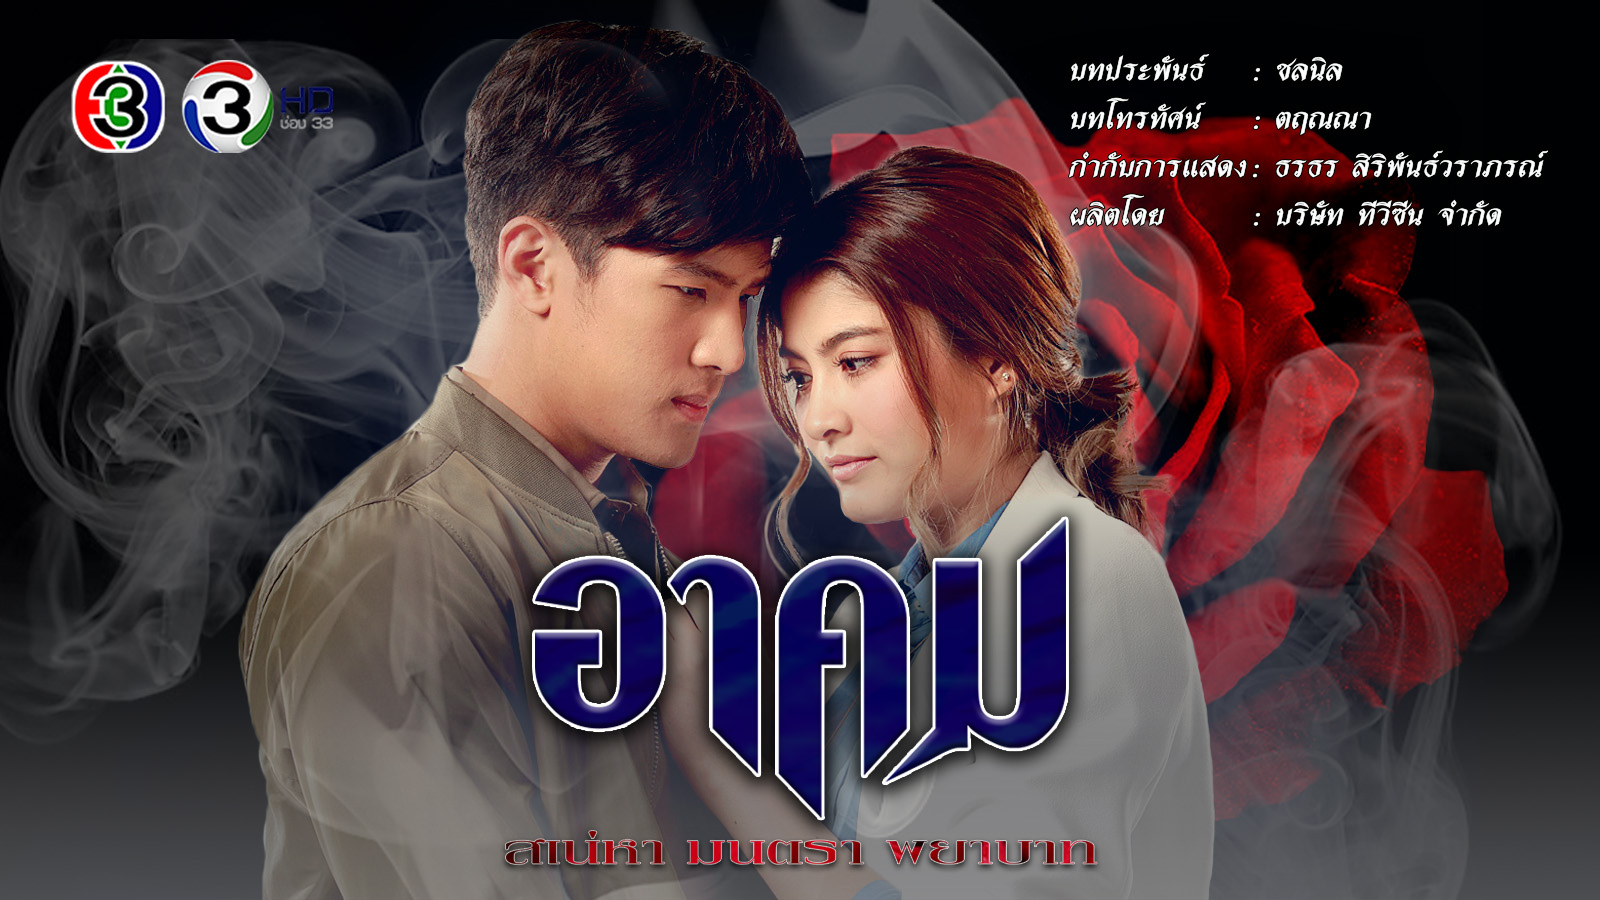 【泰剧OST】2017《魔法》(James Ma& Margie)OST下载